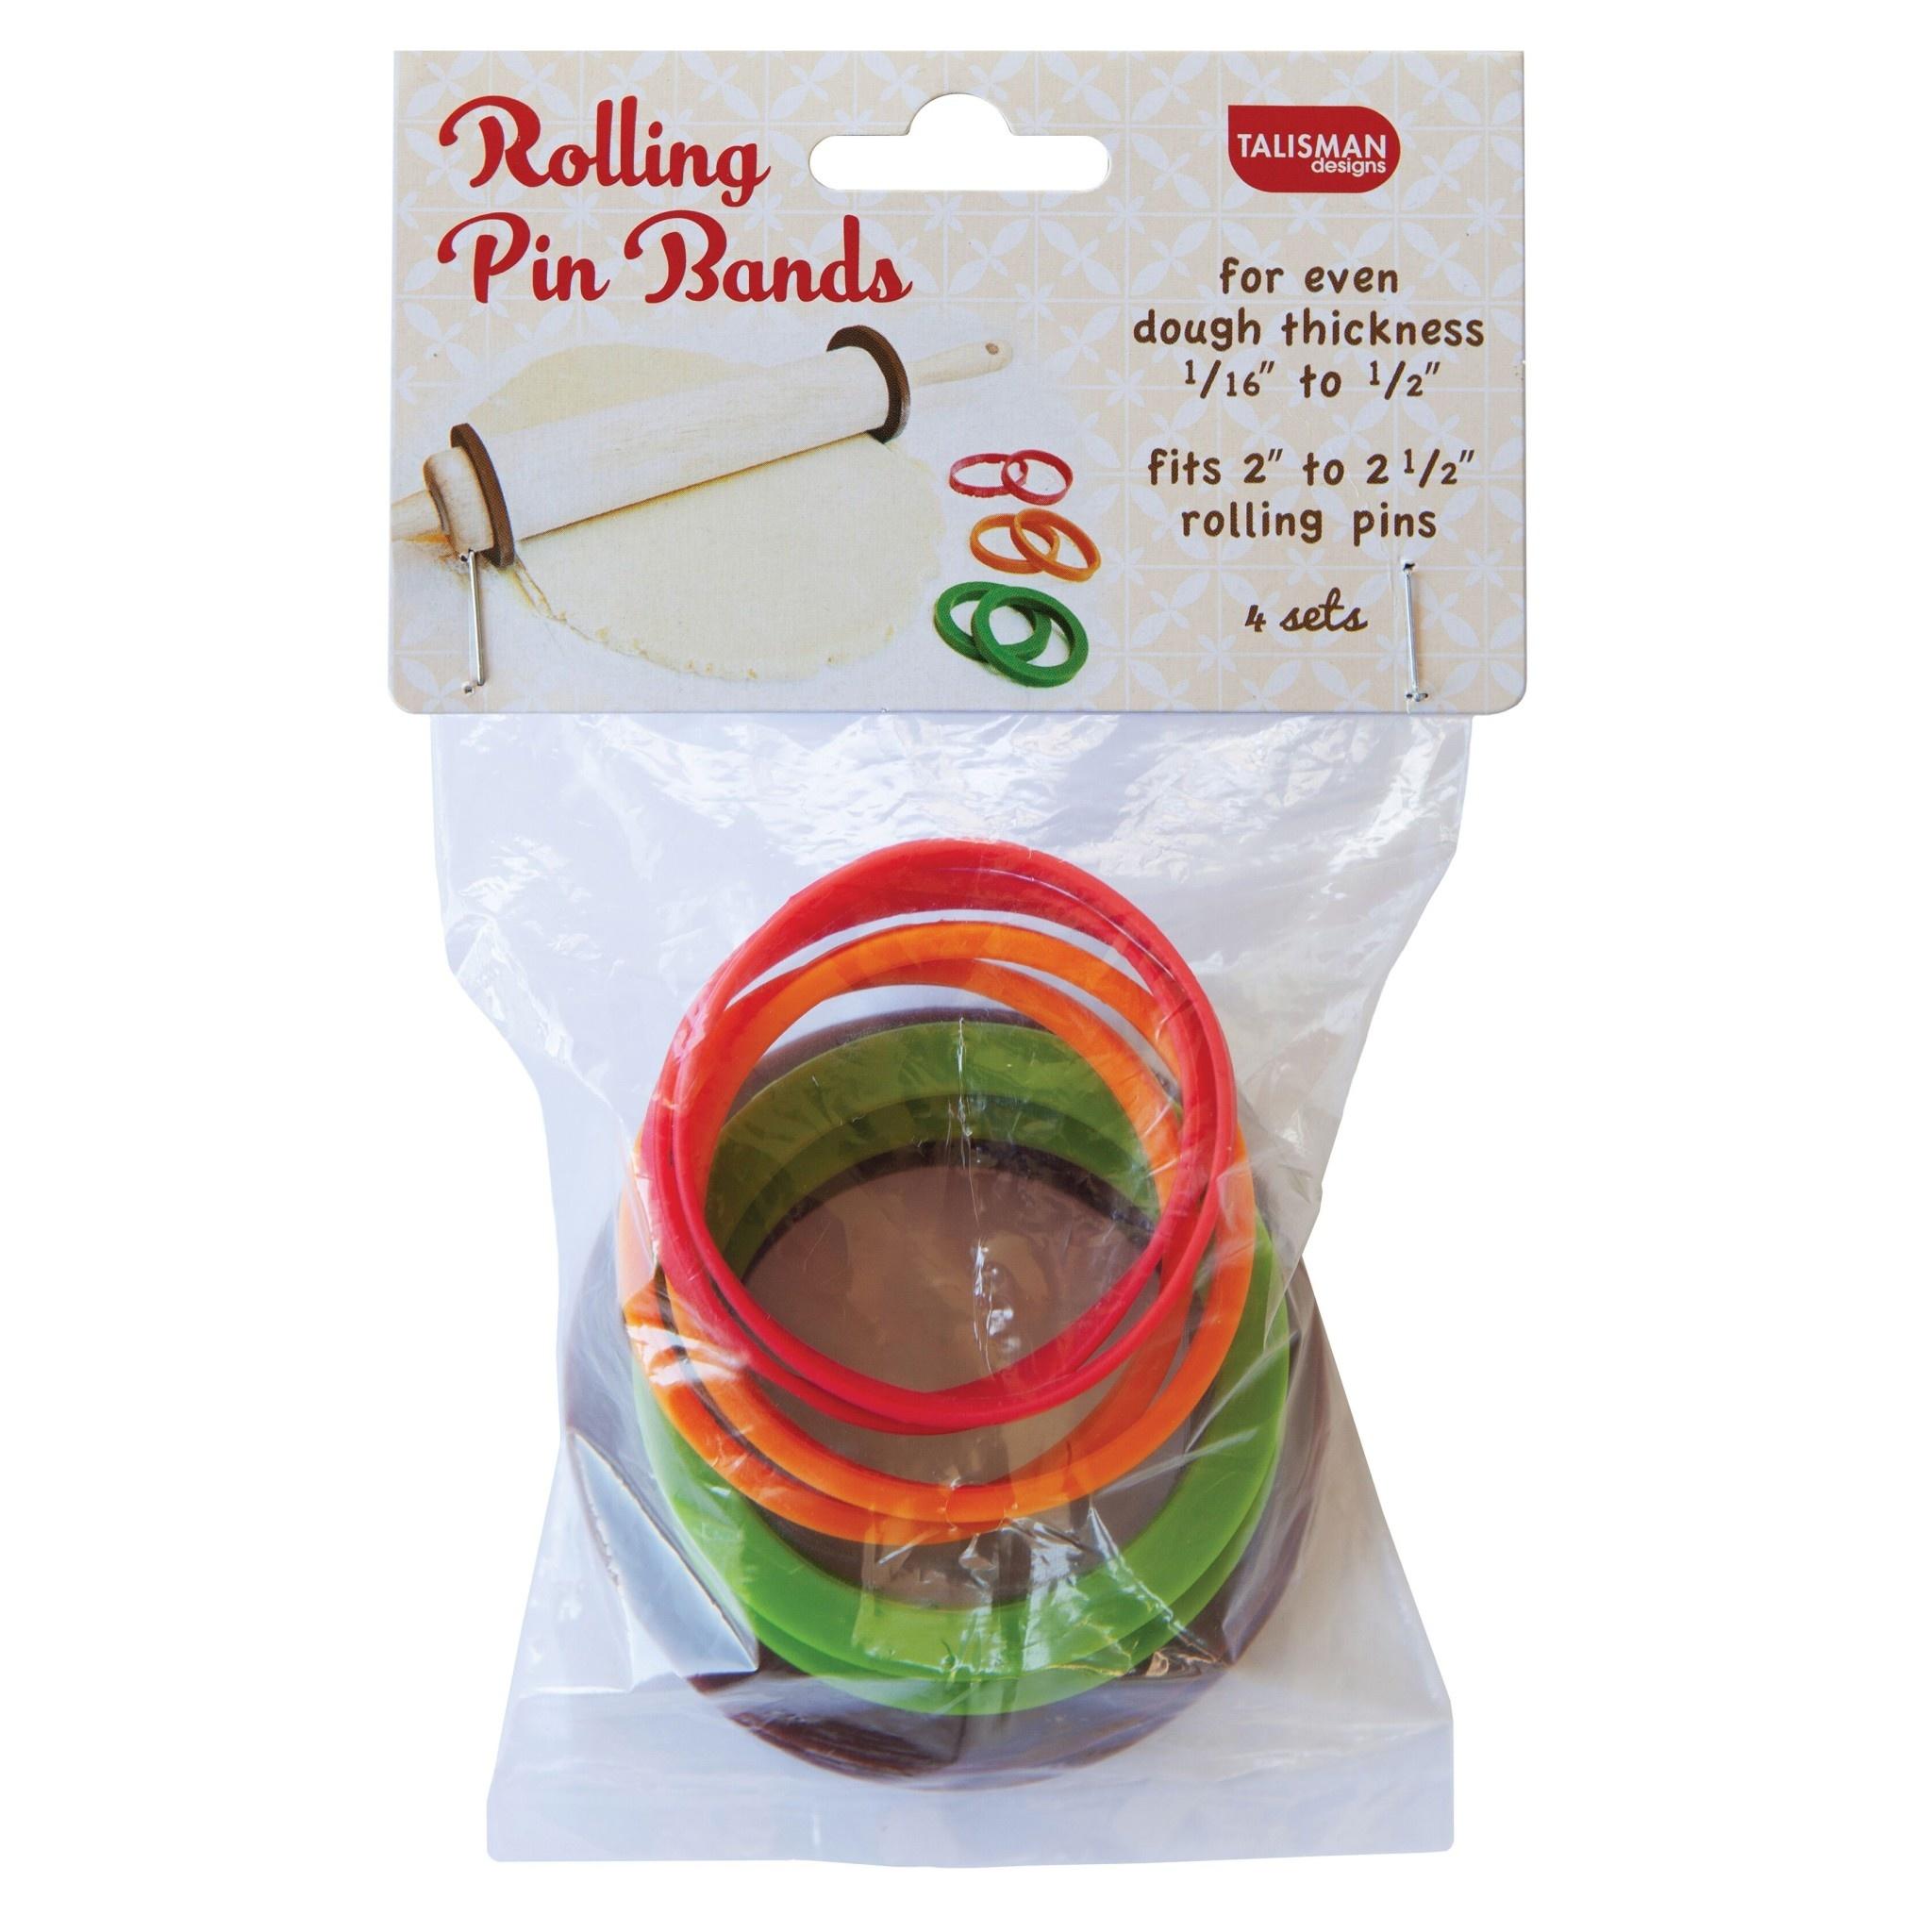 Talisman Rolling Pin Bands